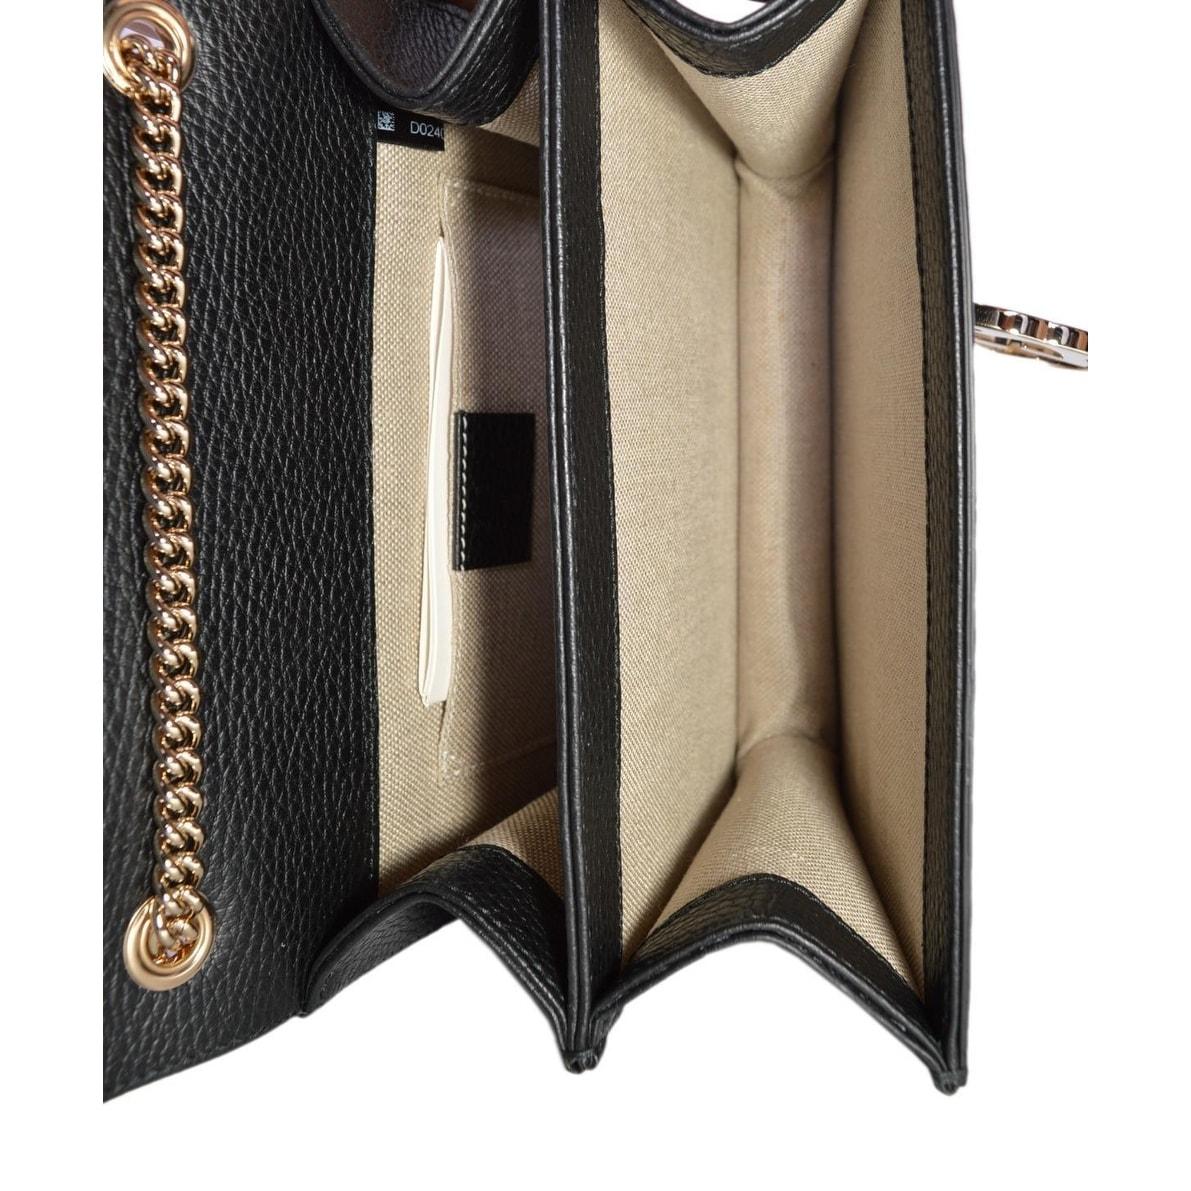 0c0cf689a7132 Shop Gucci Women s Black Leather 510304 Interlocking GG Crossbody Purse  Handbag - 7.75